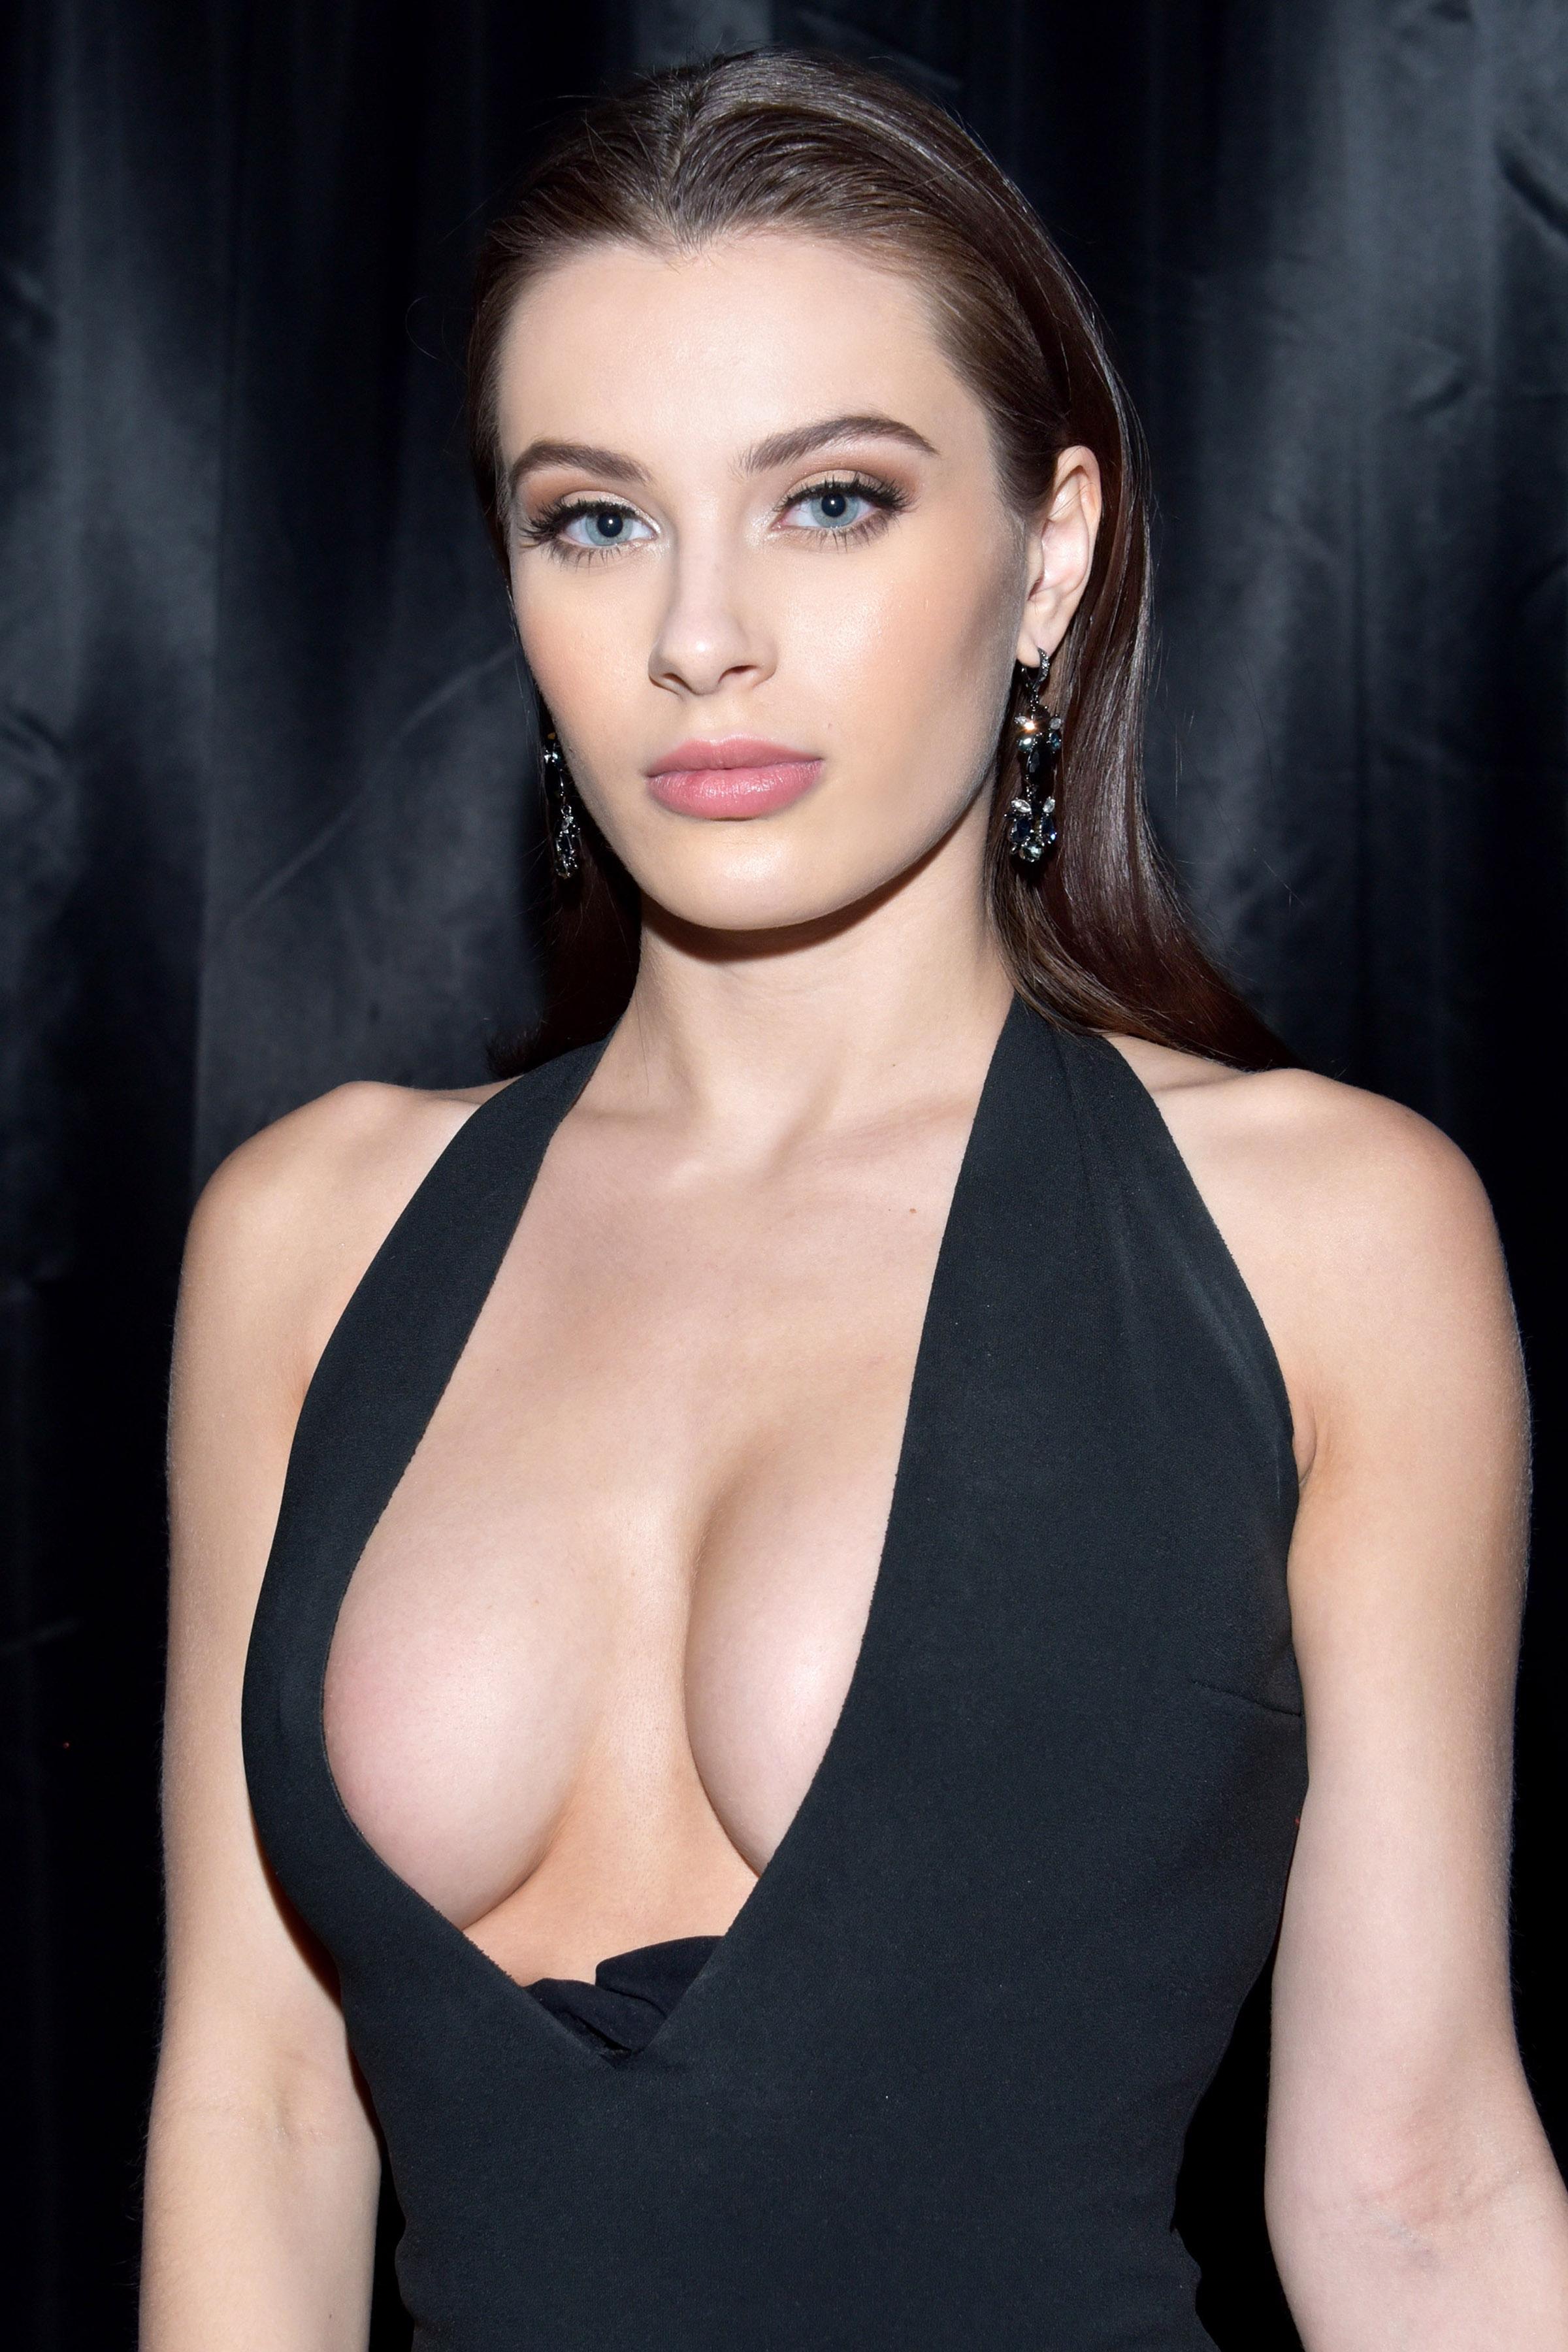 adult internet database actress